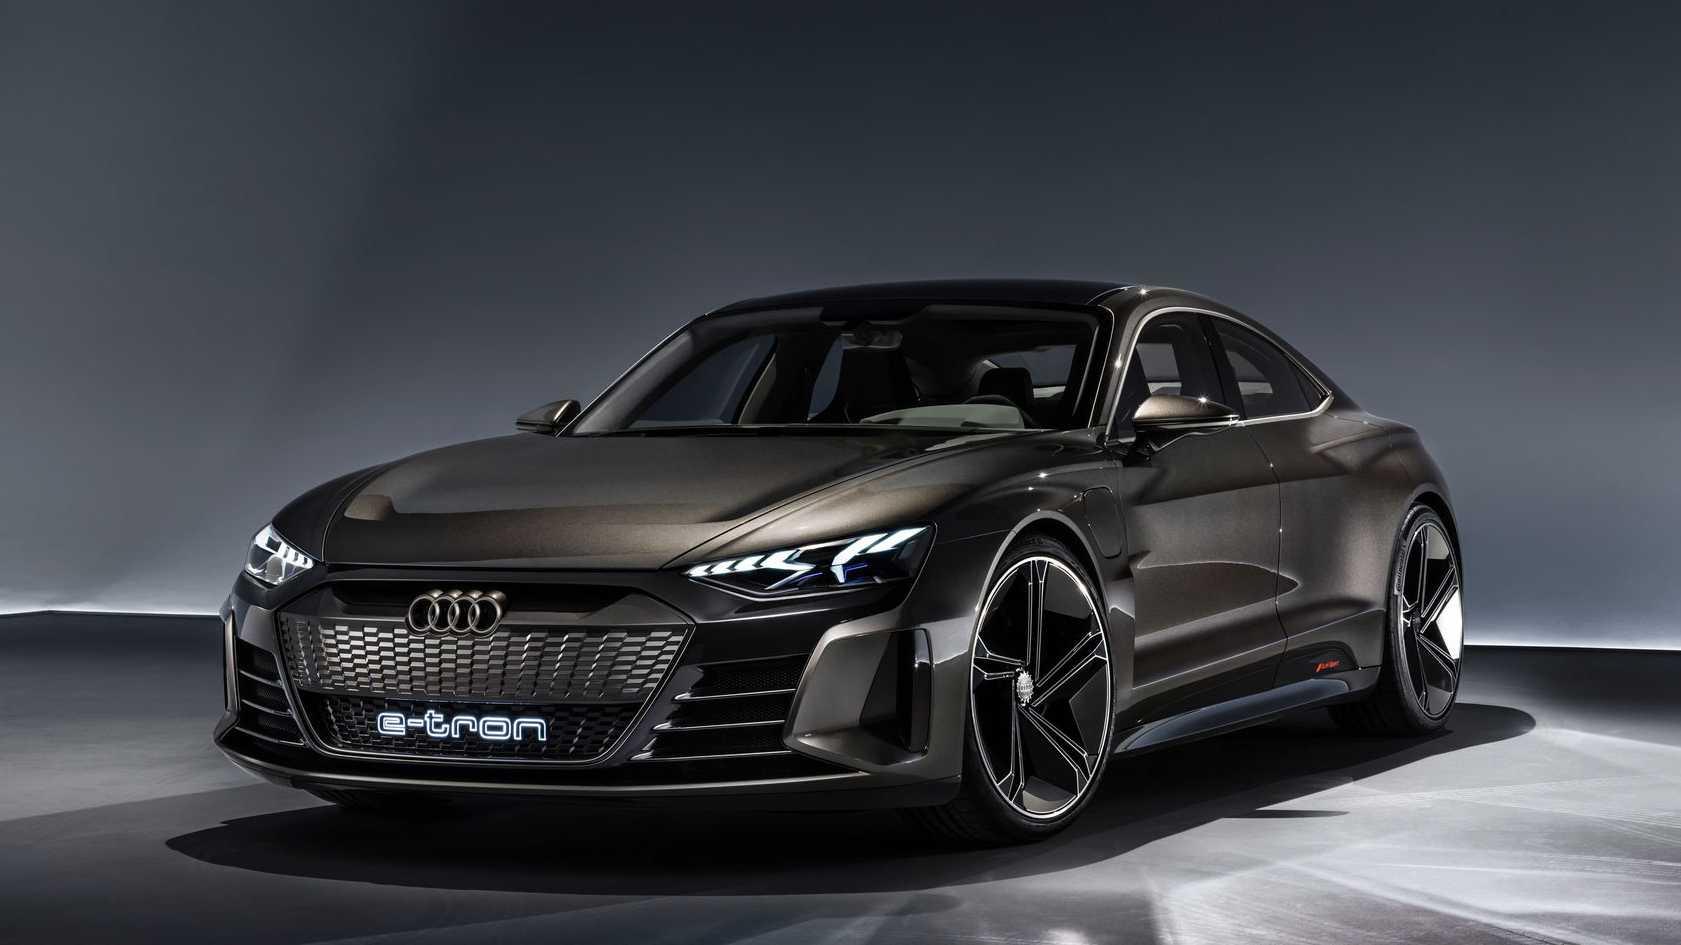 Elektroauto: Audi zeigt e-tron GT concept